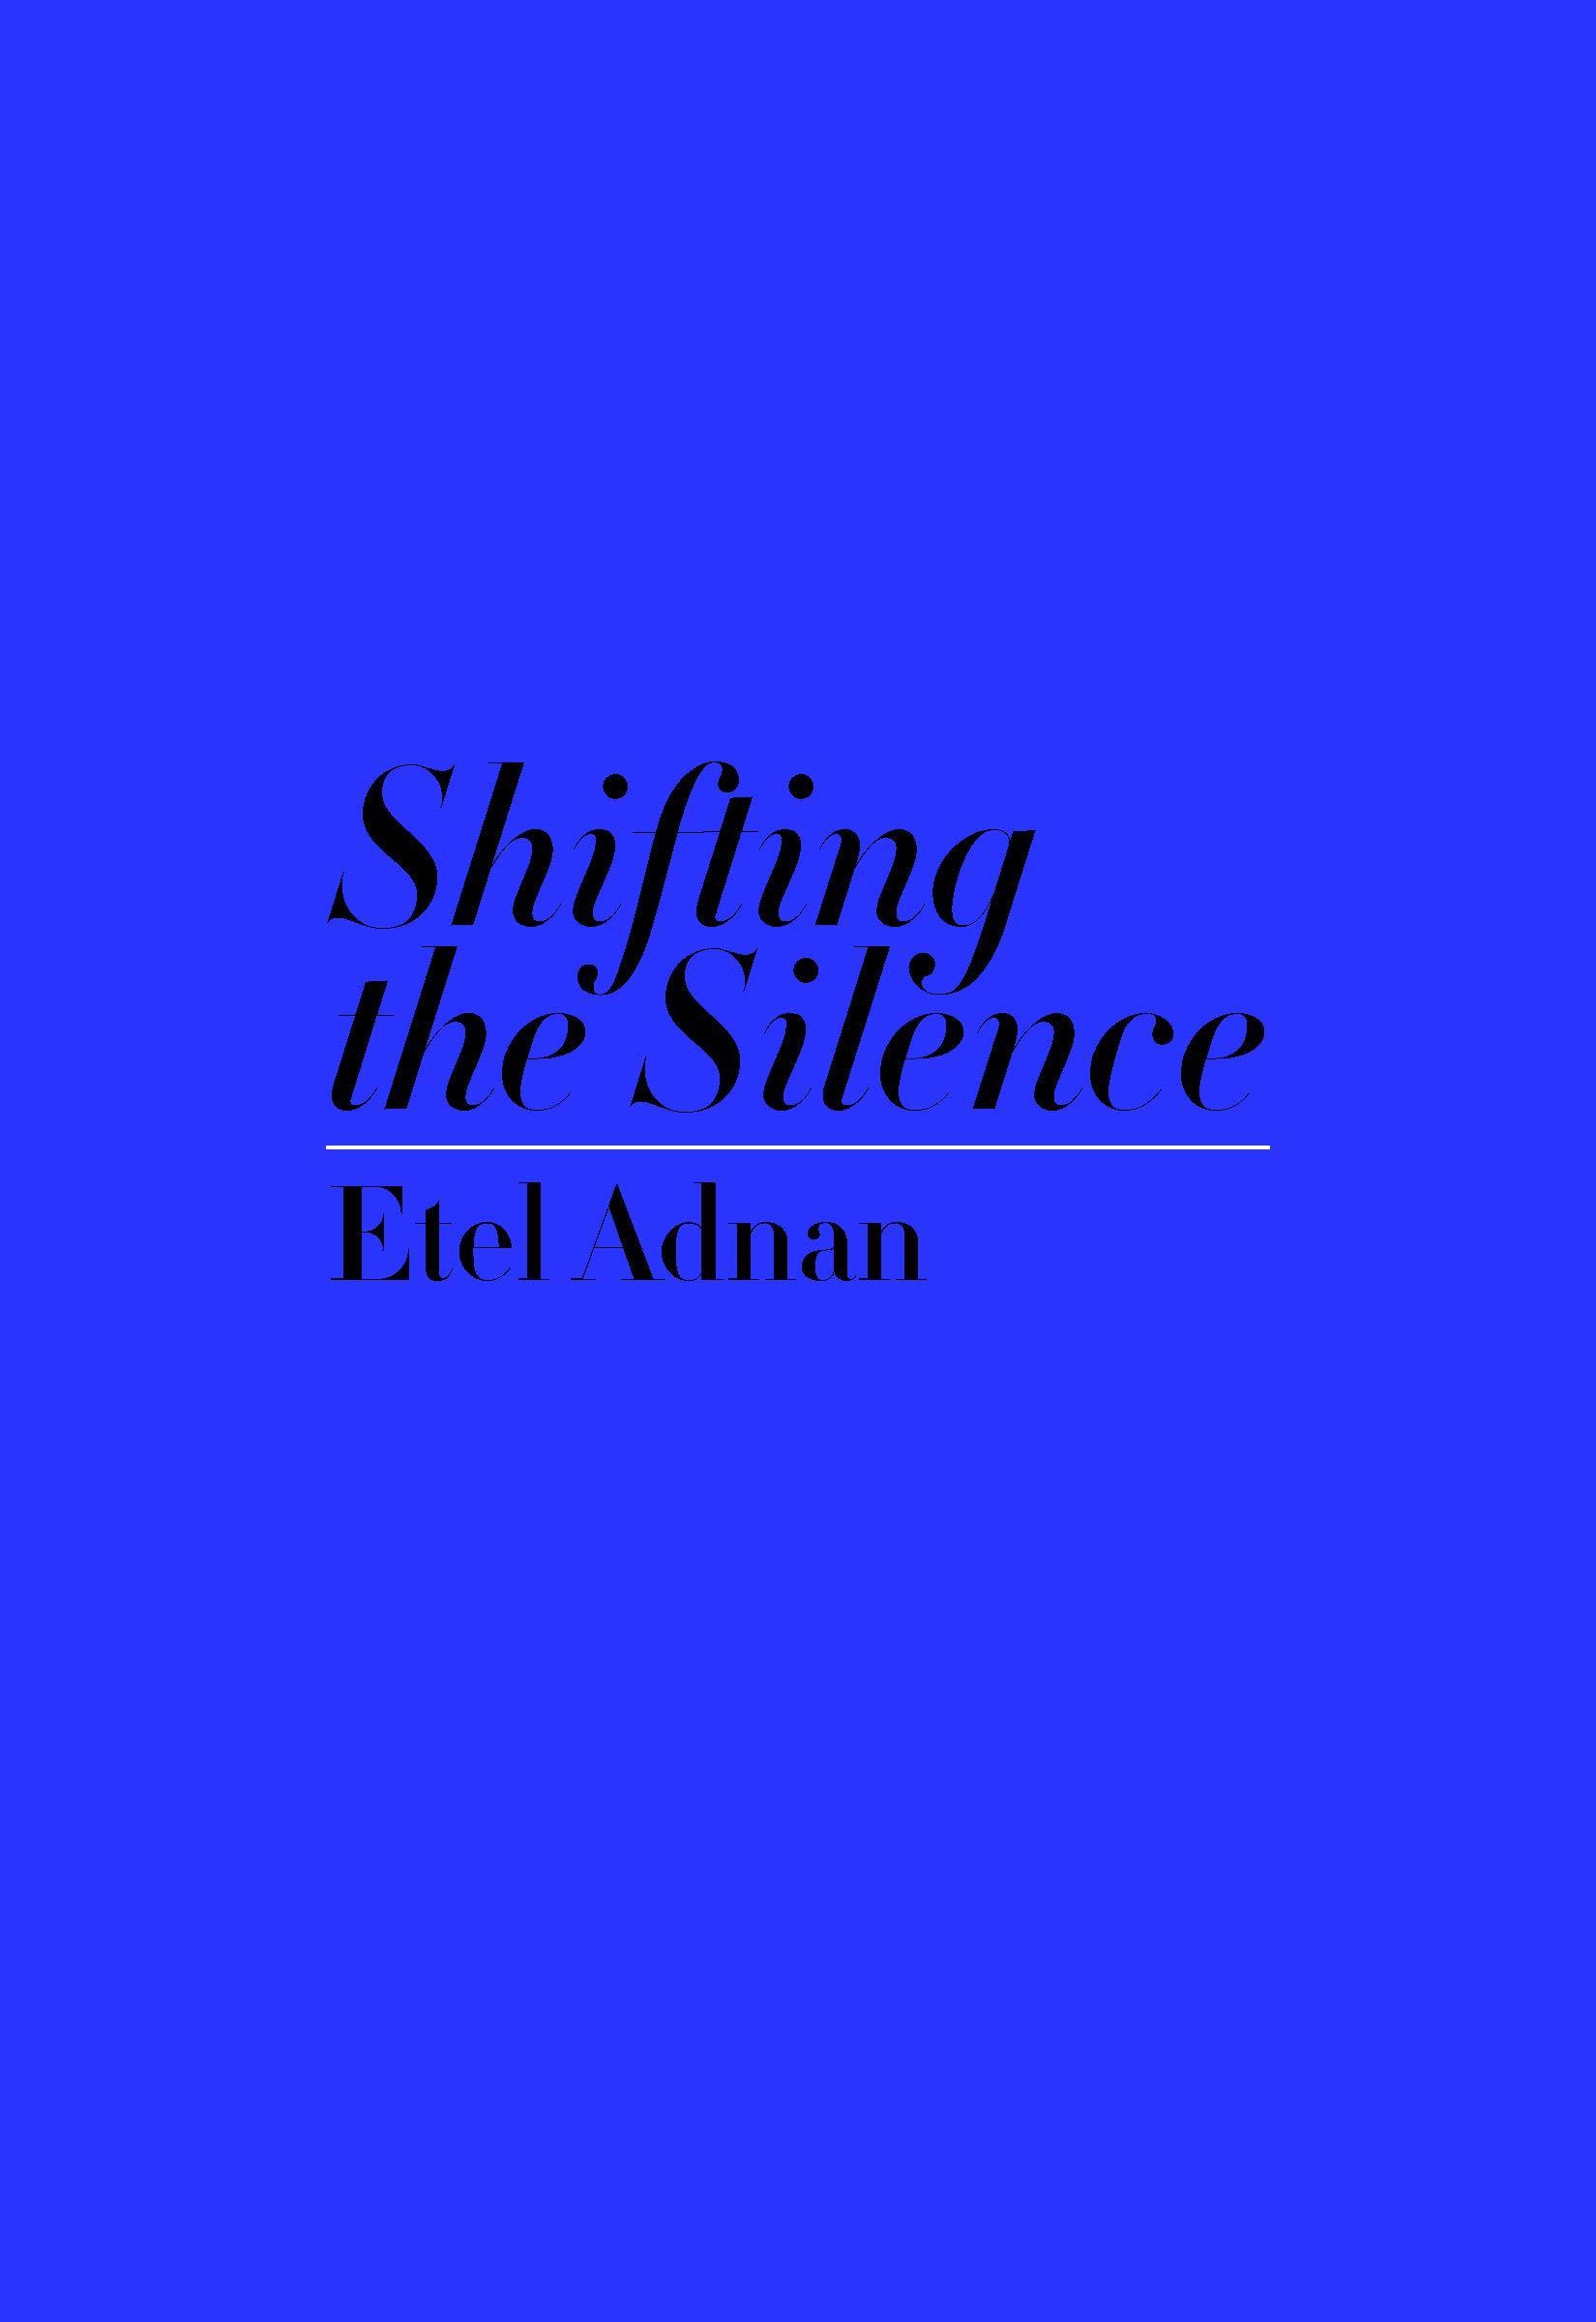 Shifting the Silence